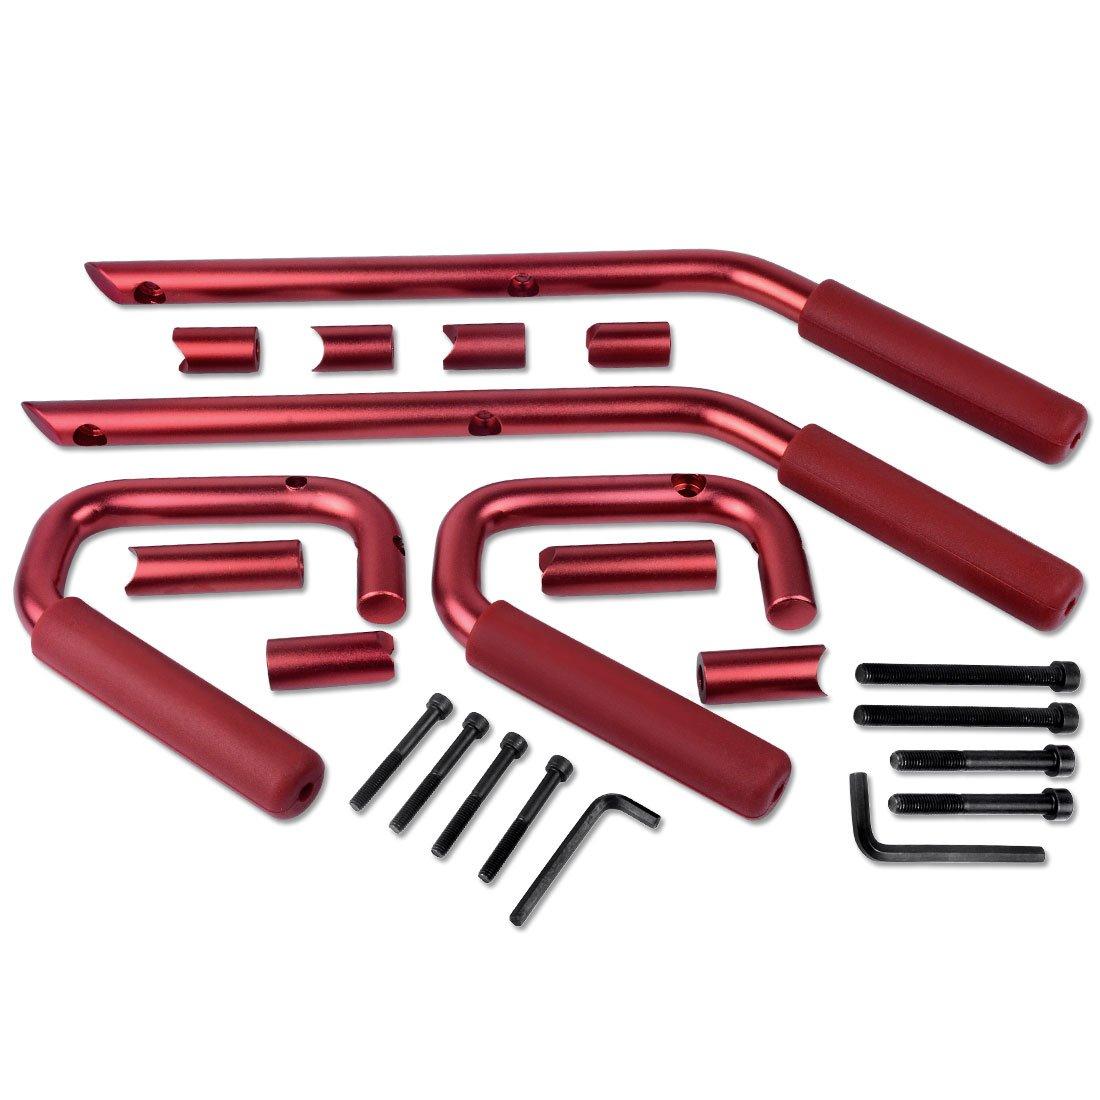 Red AUTOSAVER88 Front /& Rear Grab Handle Bar Kit 2007-2018 Jeep Wrangler 4 Doors Solid Steel Grab Bar